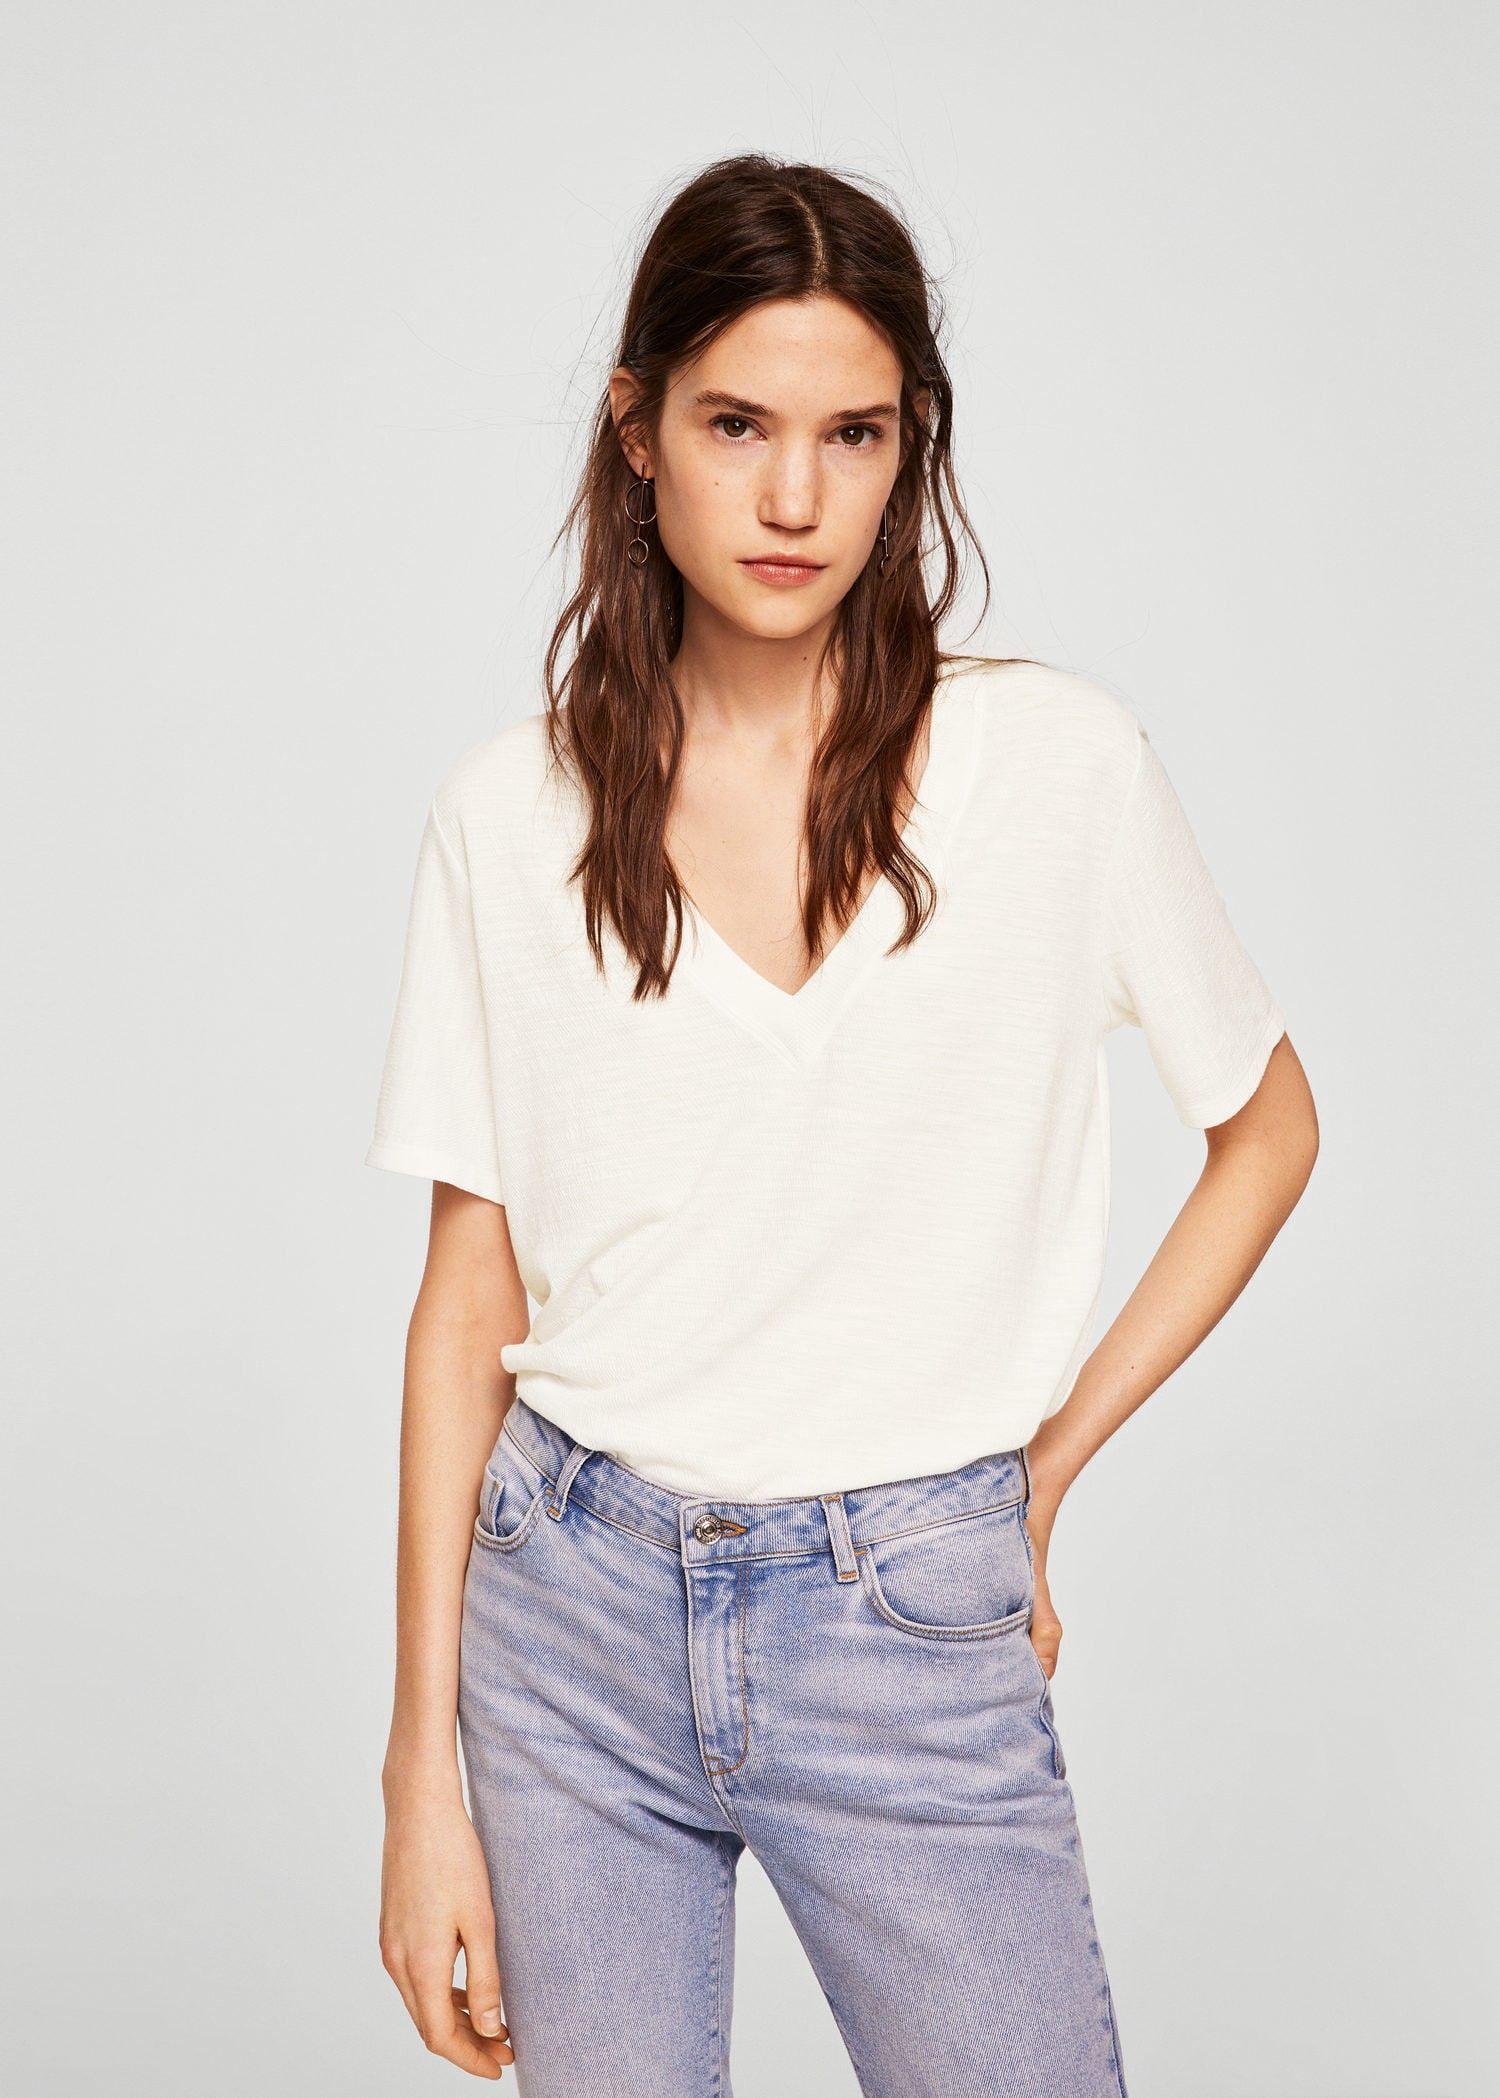 To acquire Sleeve Trendsshort sweatshirt trend picture trends